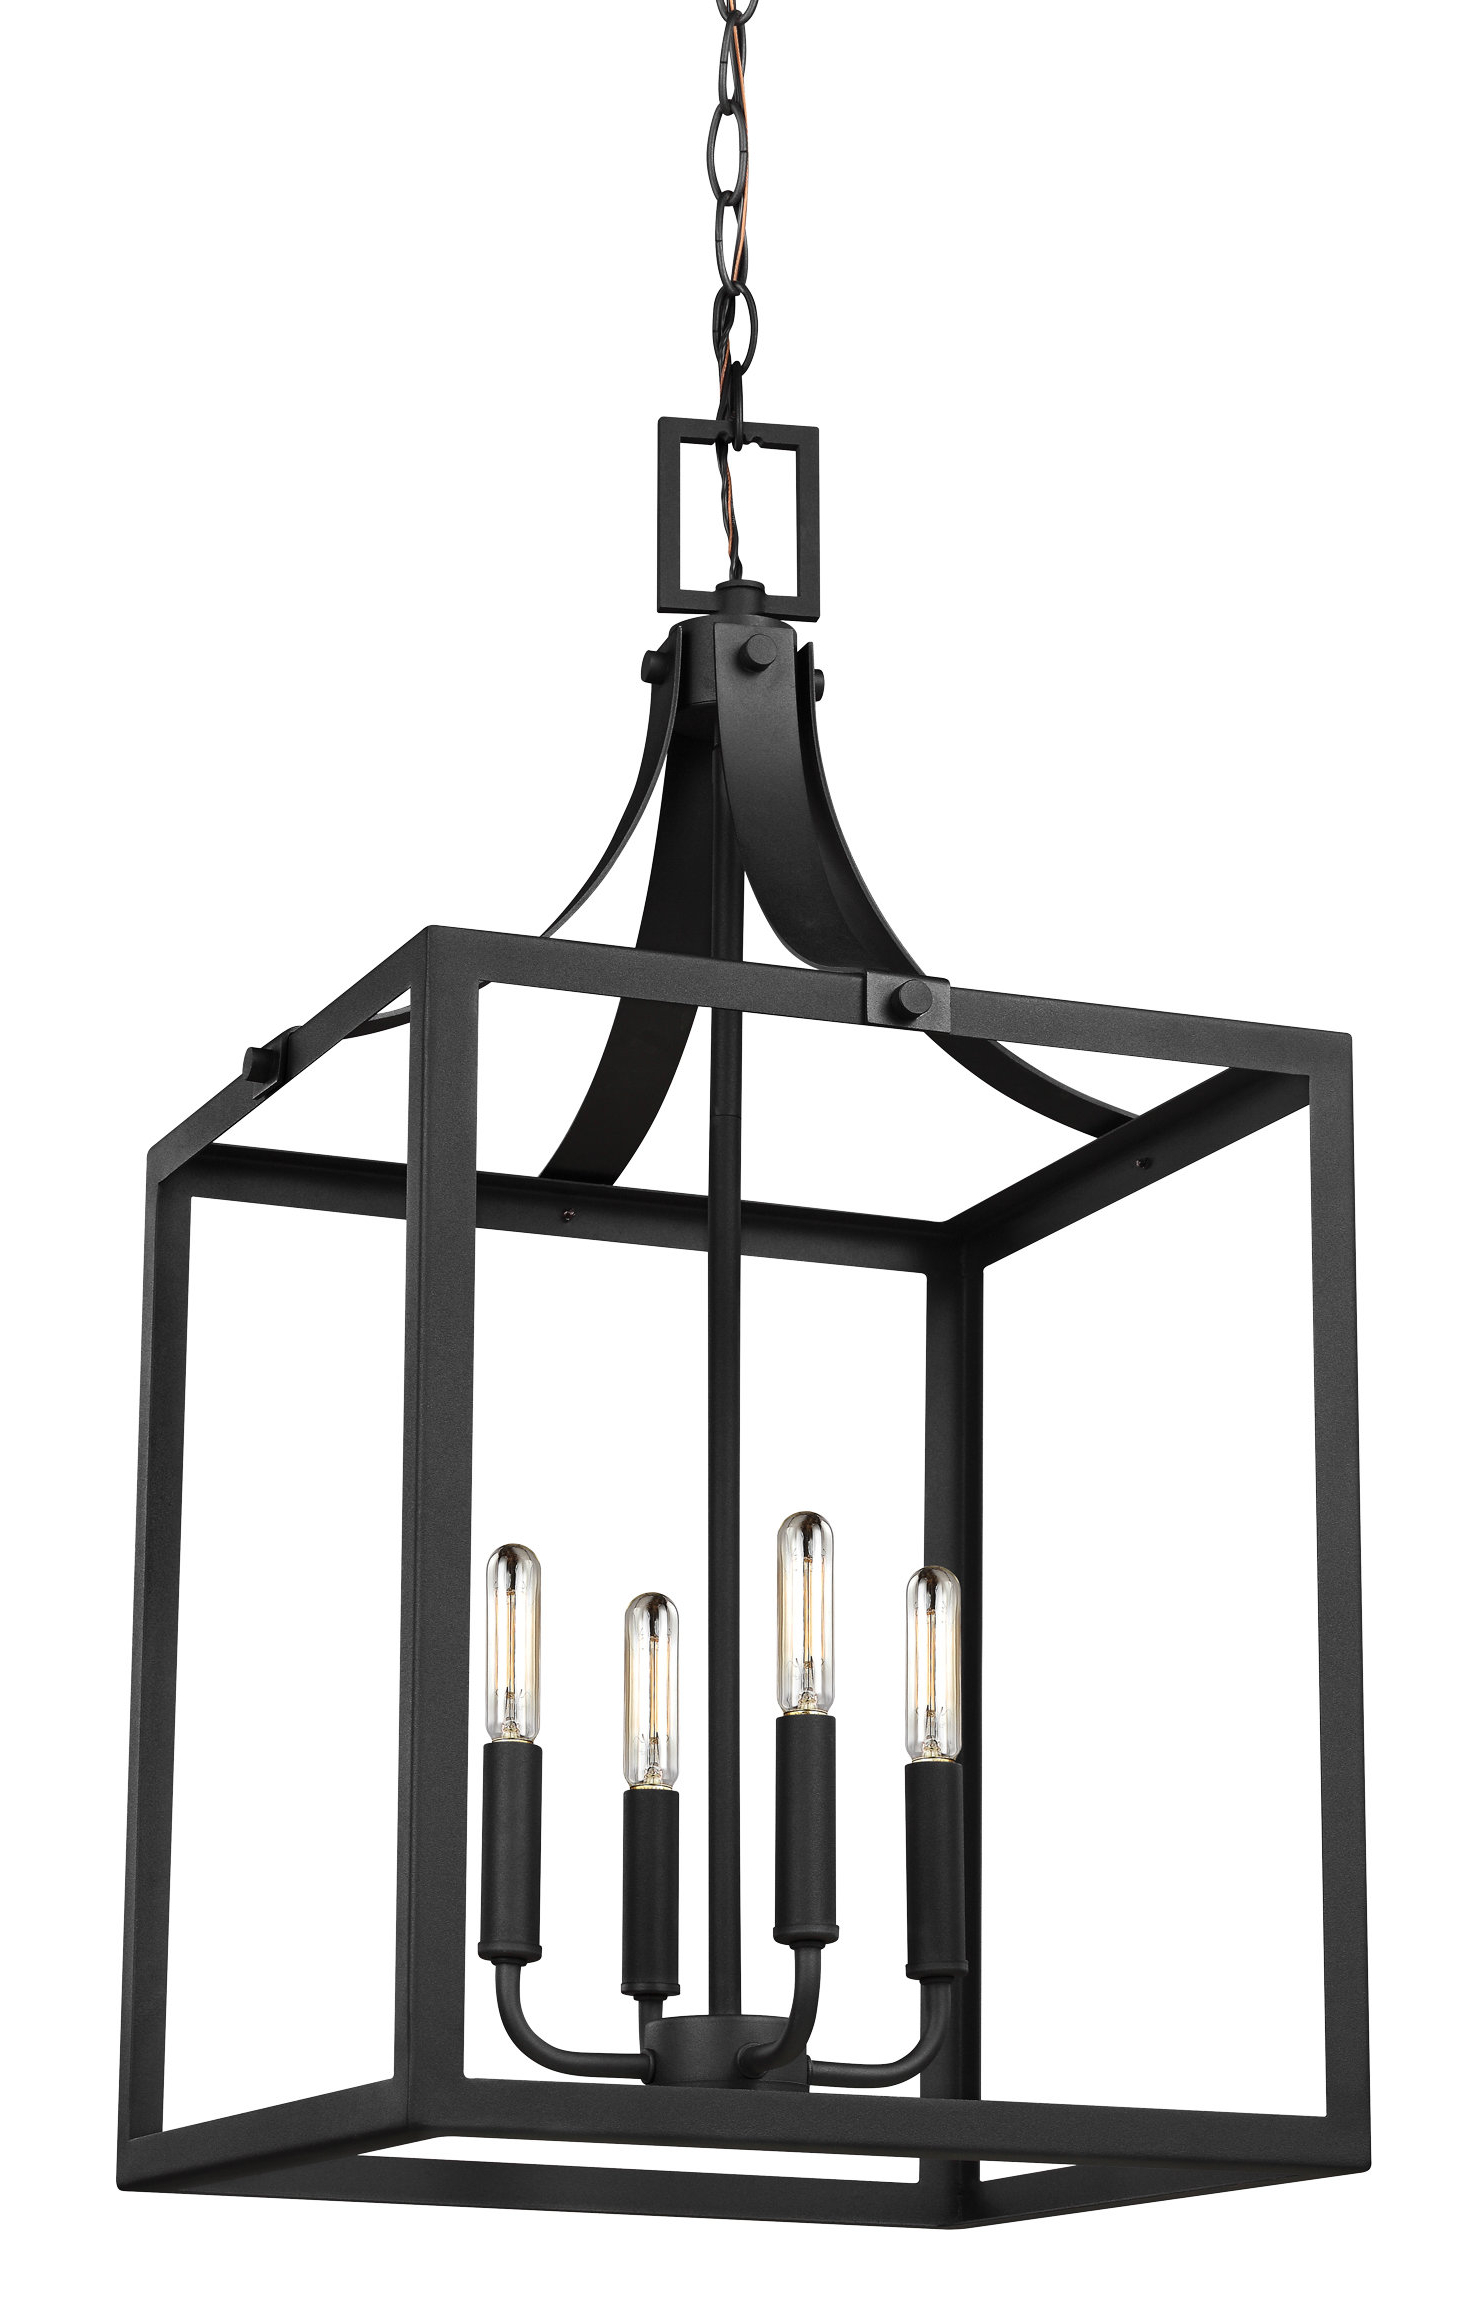 4 Light Lantern Square / Rectangle Pendants For Most Up To Date Sherri Ann 4 Light Lantern Square / Rectangle Pendant (View 6 of 20)